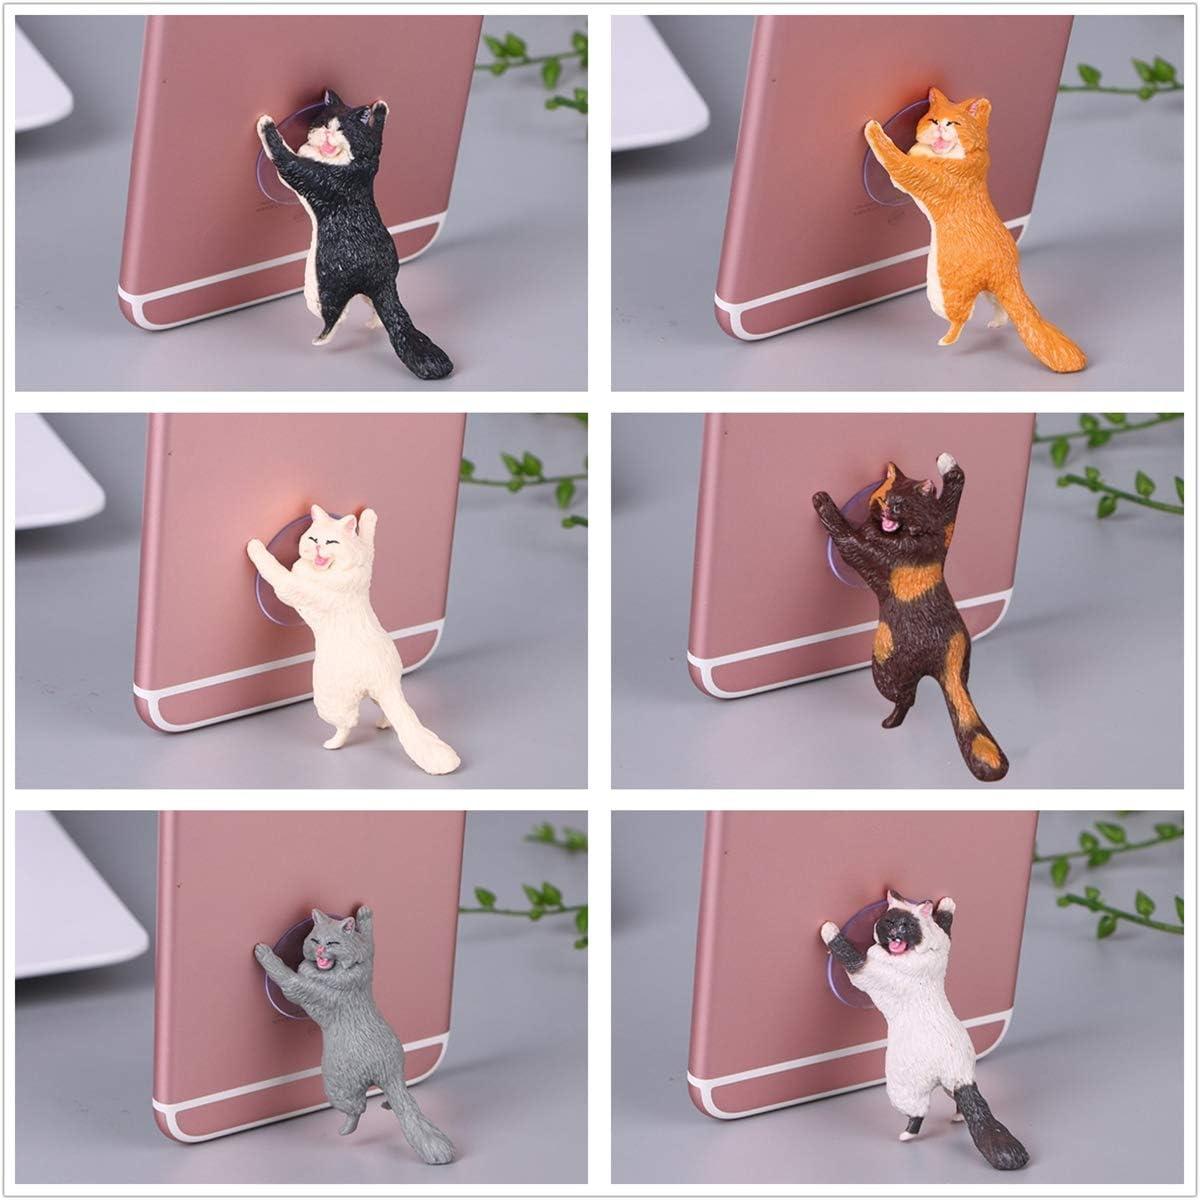 LSQR Cute Cat Phone Holder Support Mobile Phone Holder Stand Sucker Tablets Desk Sucker Design Smartphone Holder,6PCS